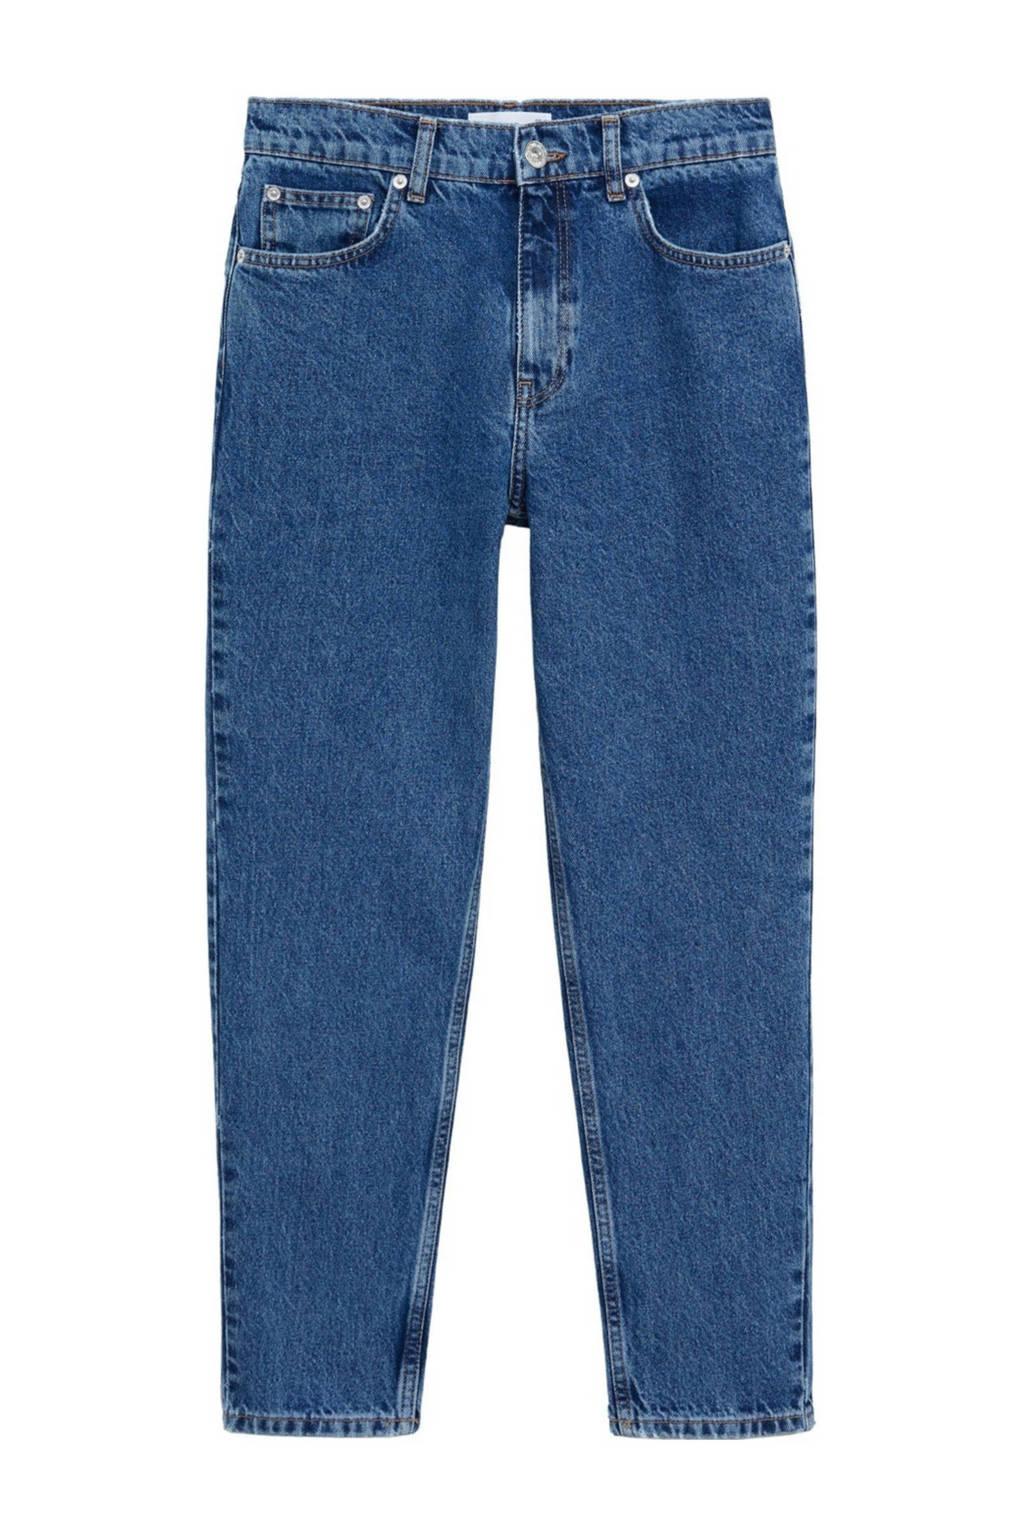 Mango high waist mom jeans blauw, Blauw